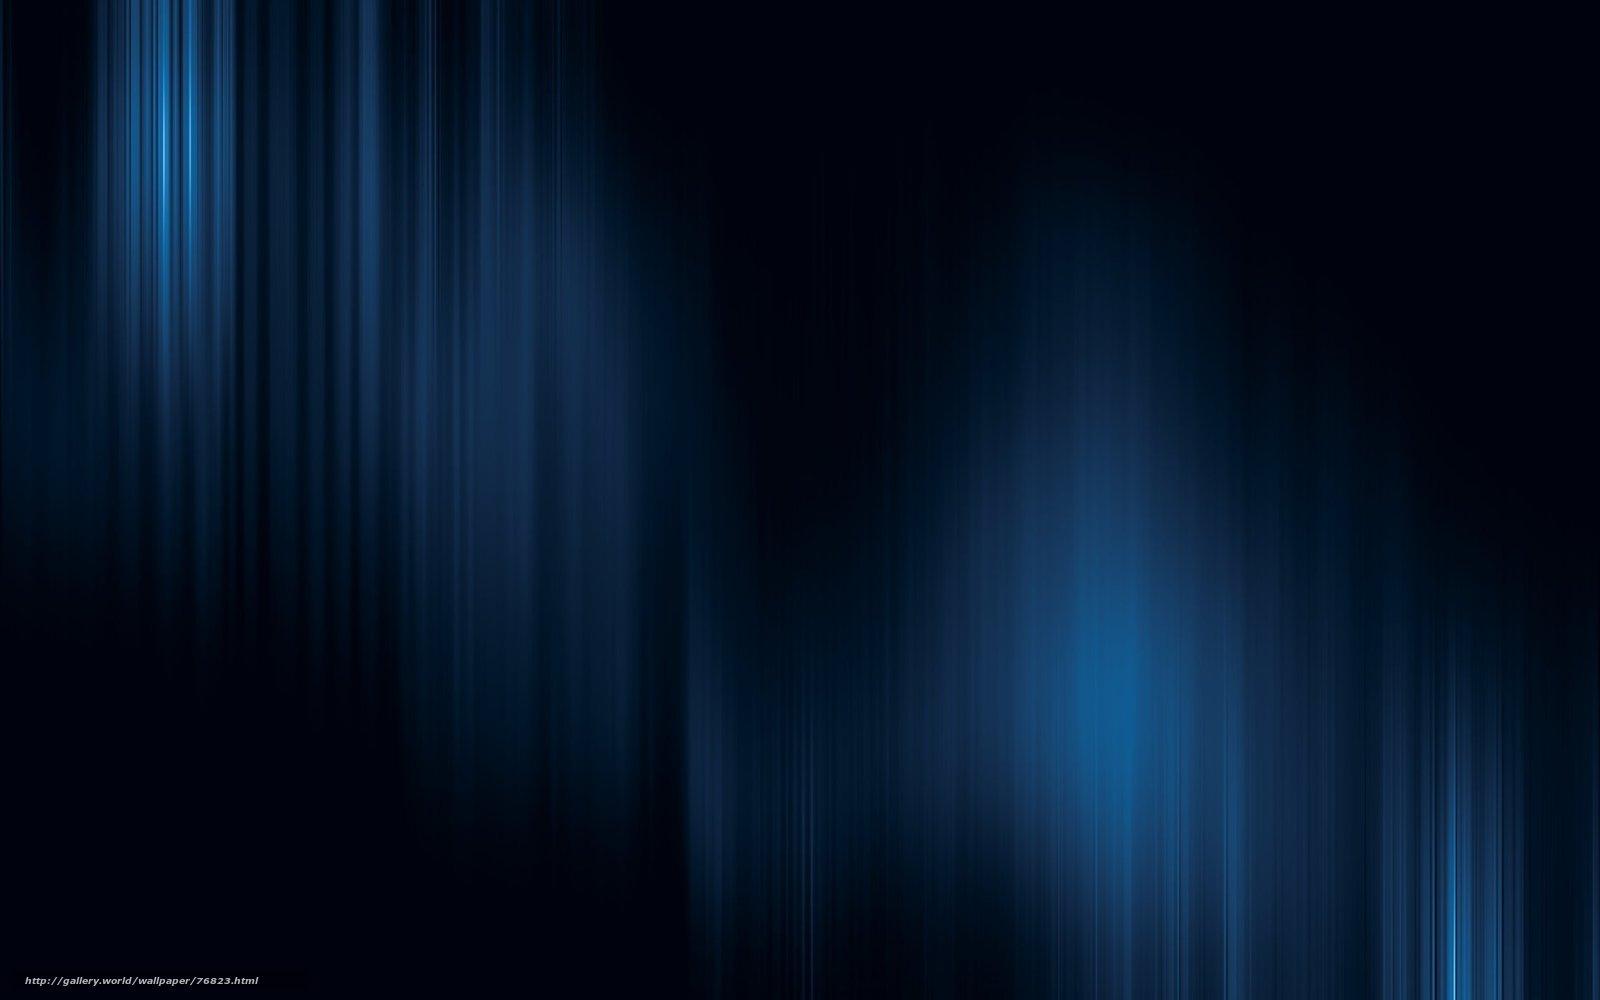 Scaricare Gli Sfondi Sfondo Nero Blu Strisce Luce Sfondi Gratis